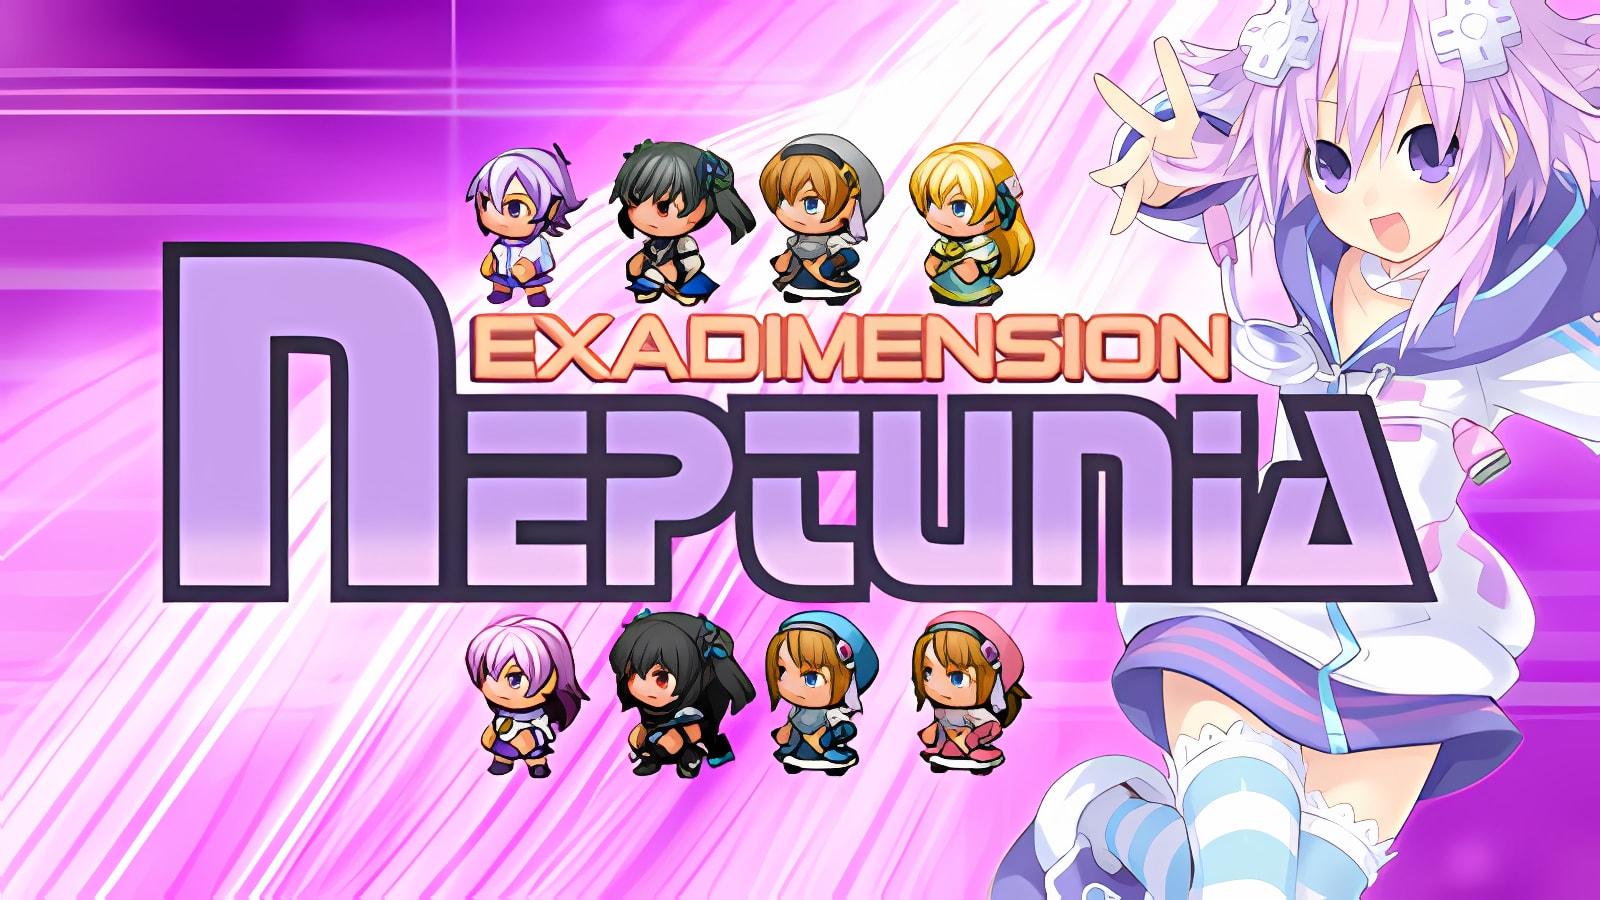 Exadimension Neptunia